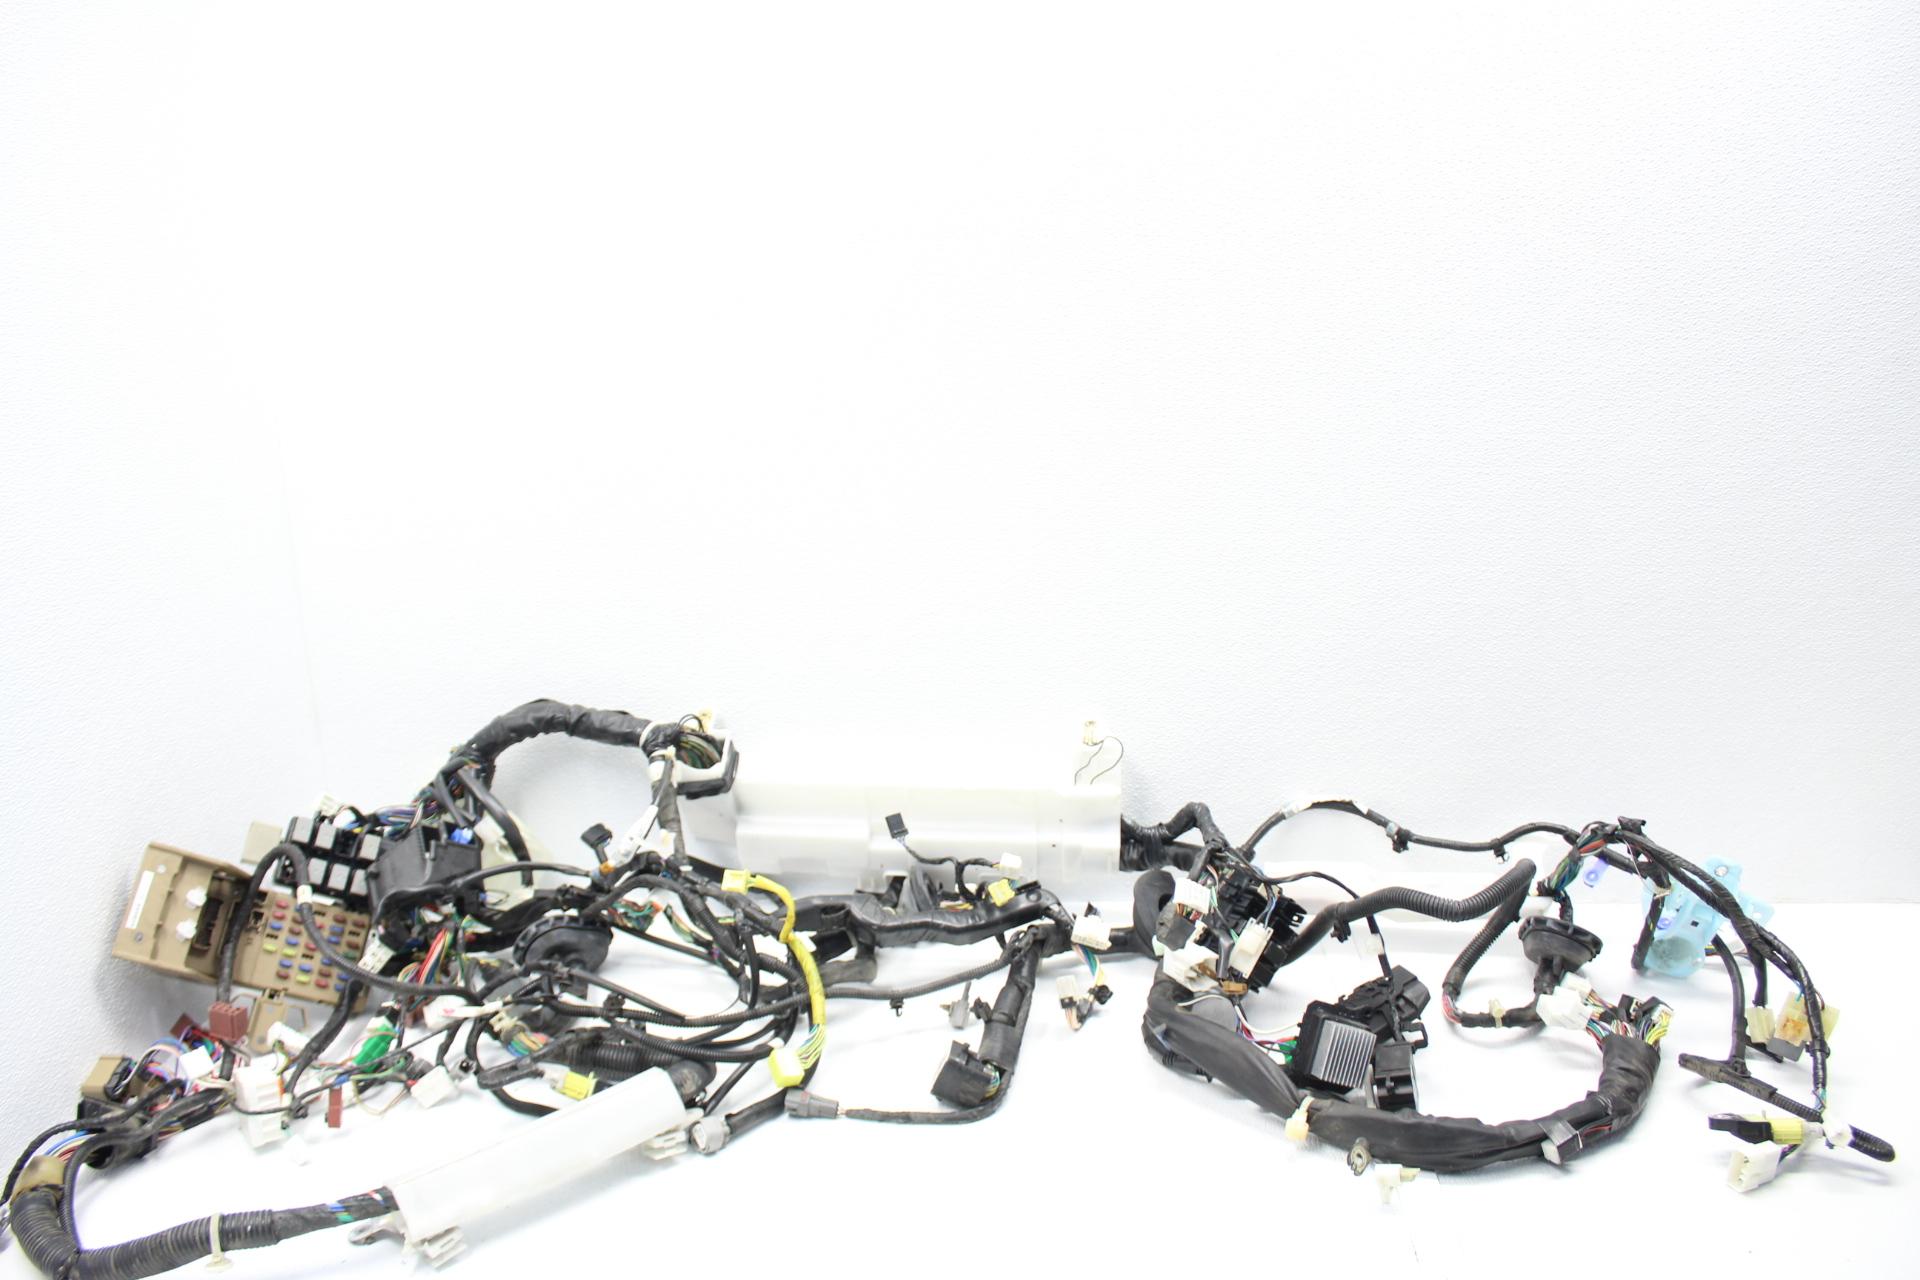 11 Subaru Wrx Sti Bulkhead Dash Wiring Harness Oem